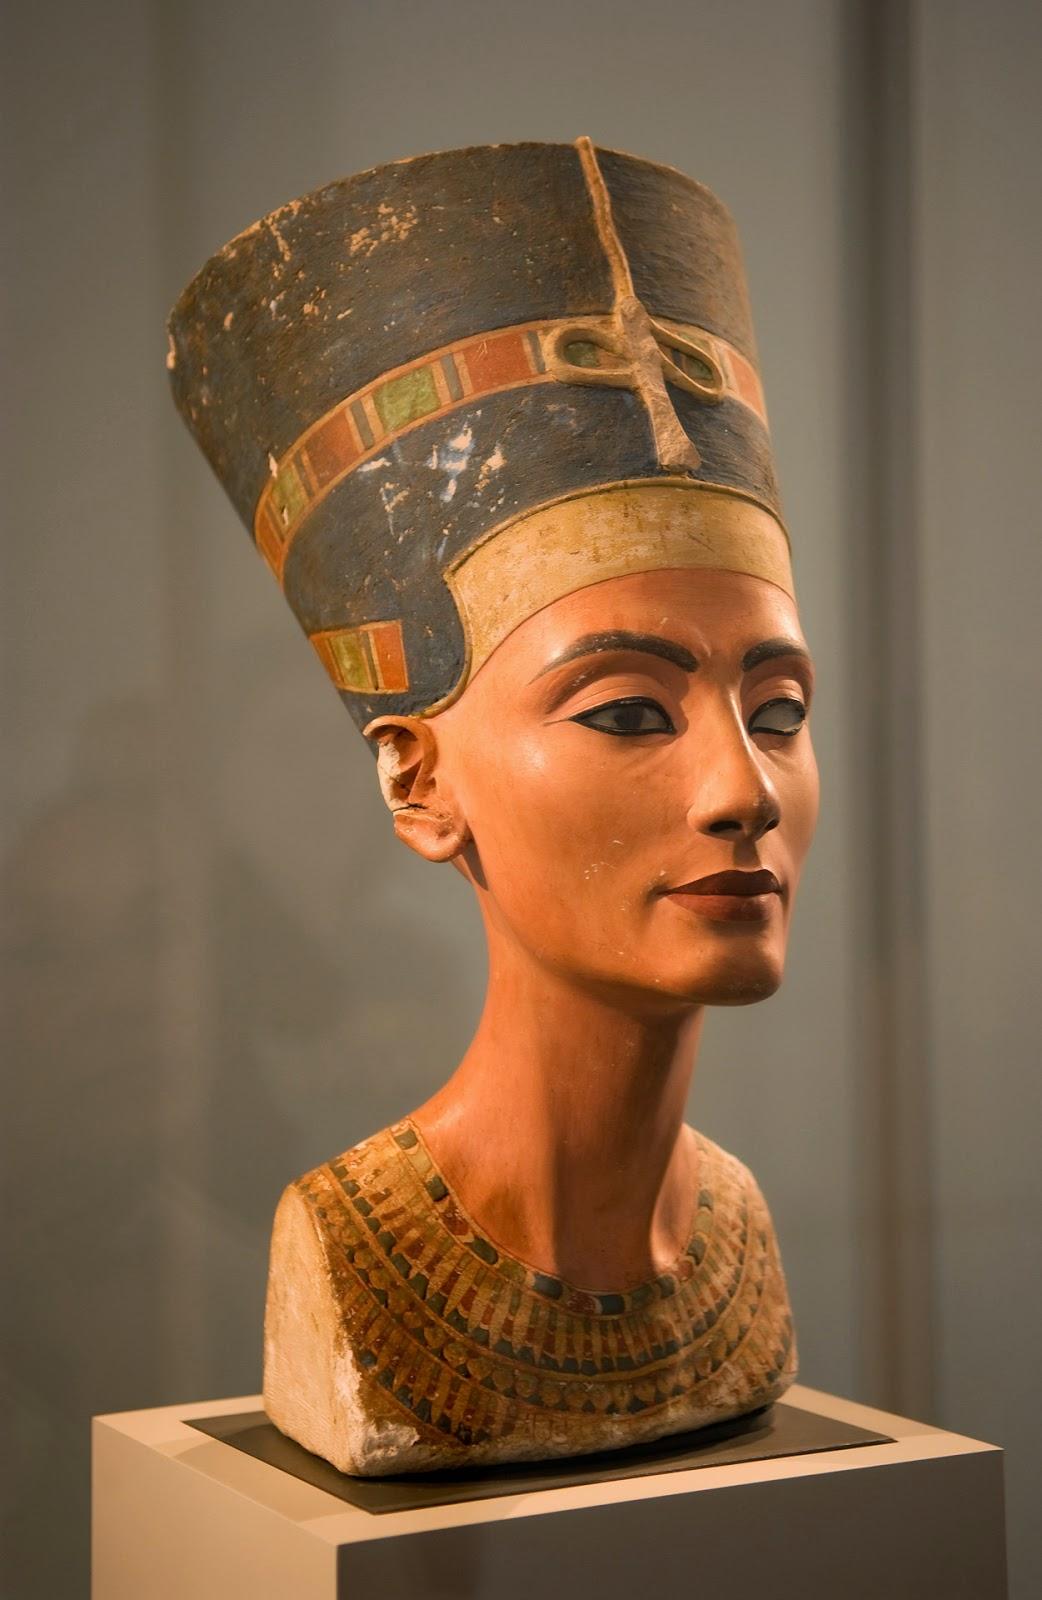 8. Nefertiti